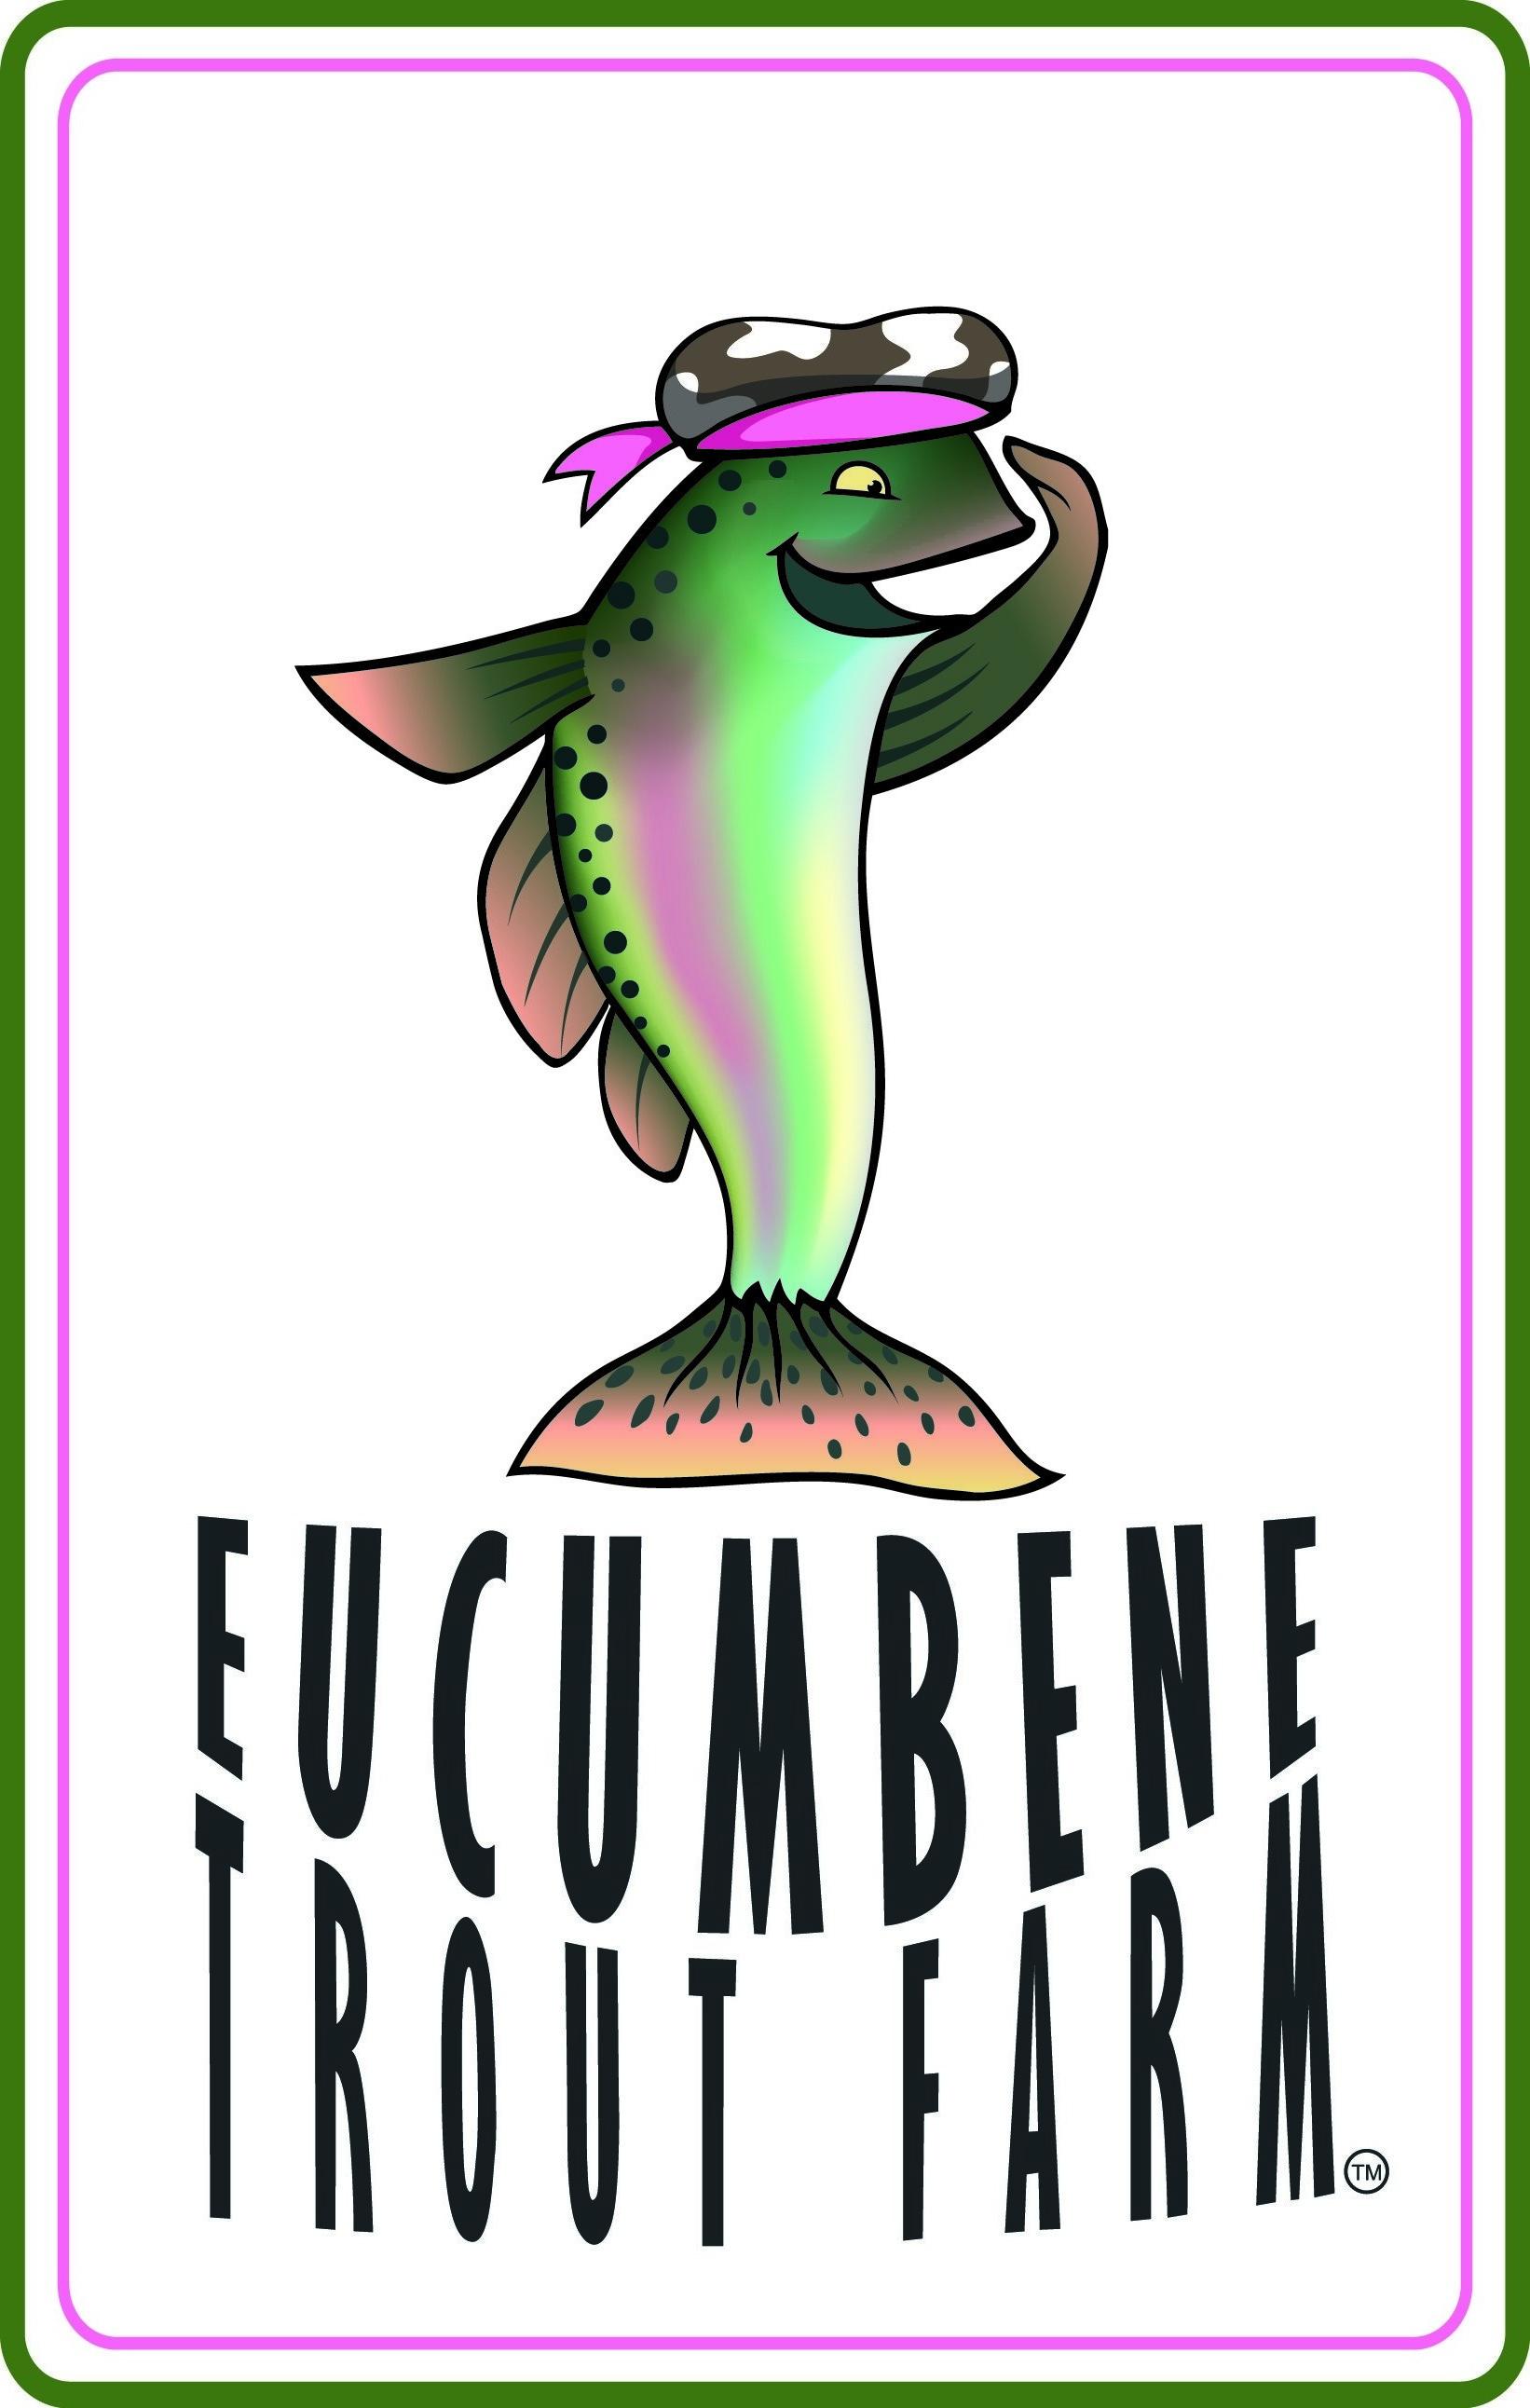 Eucumbene_logo